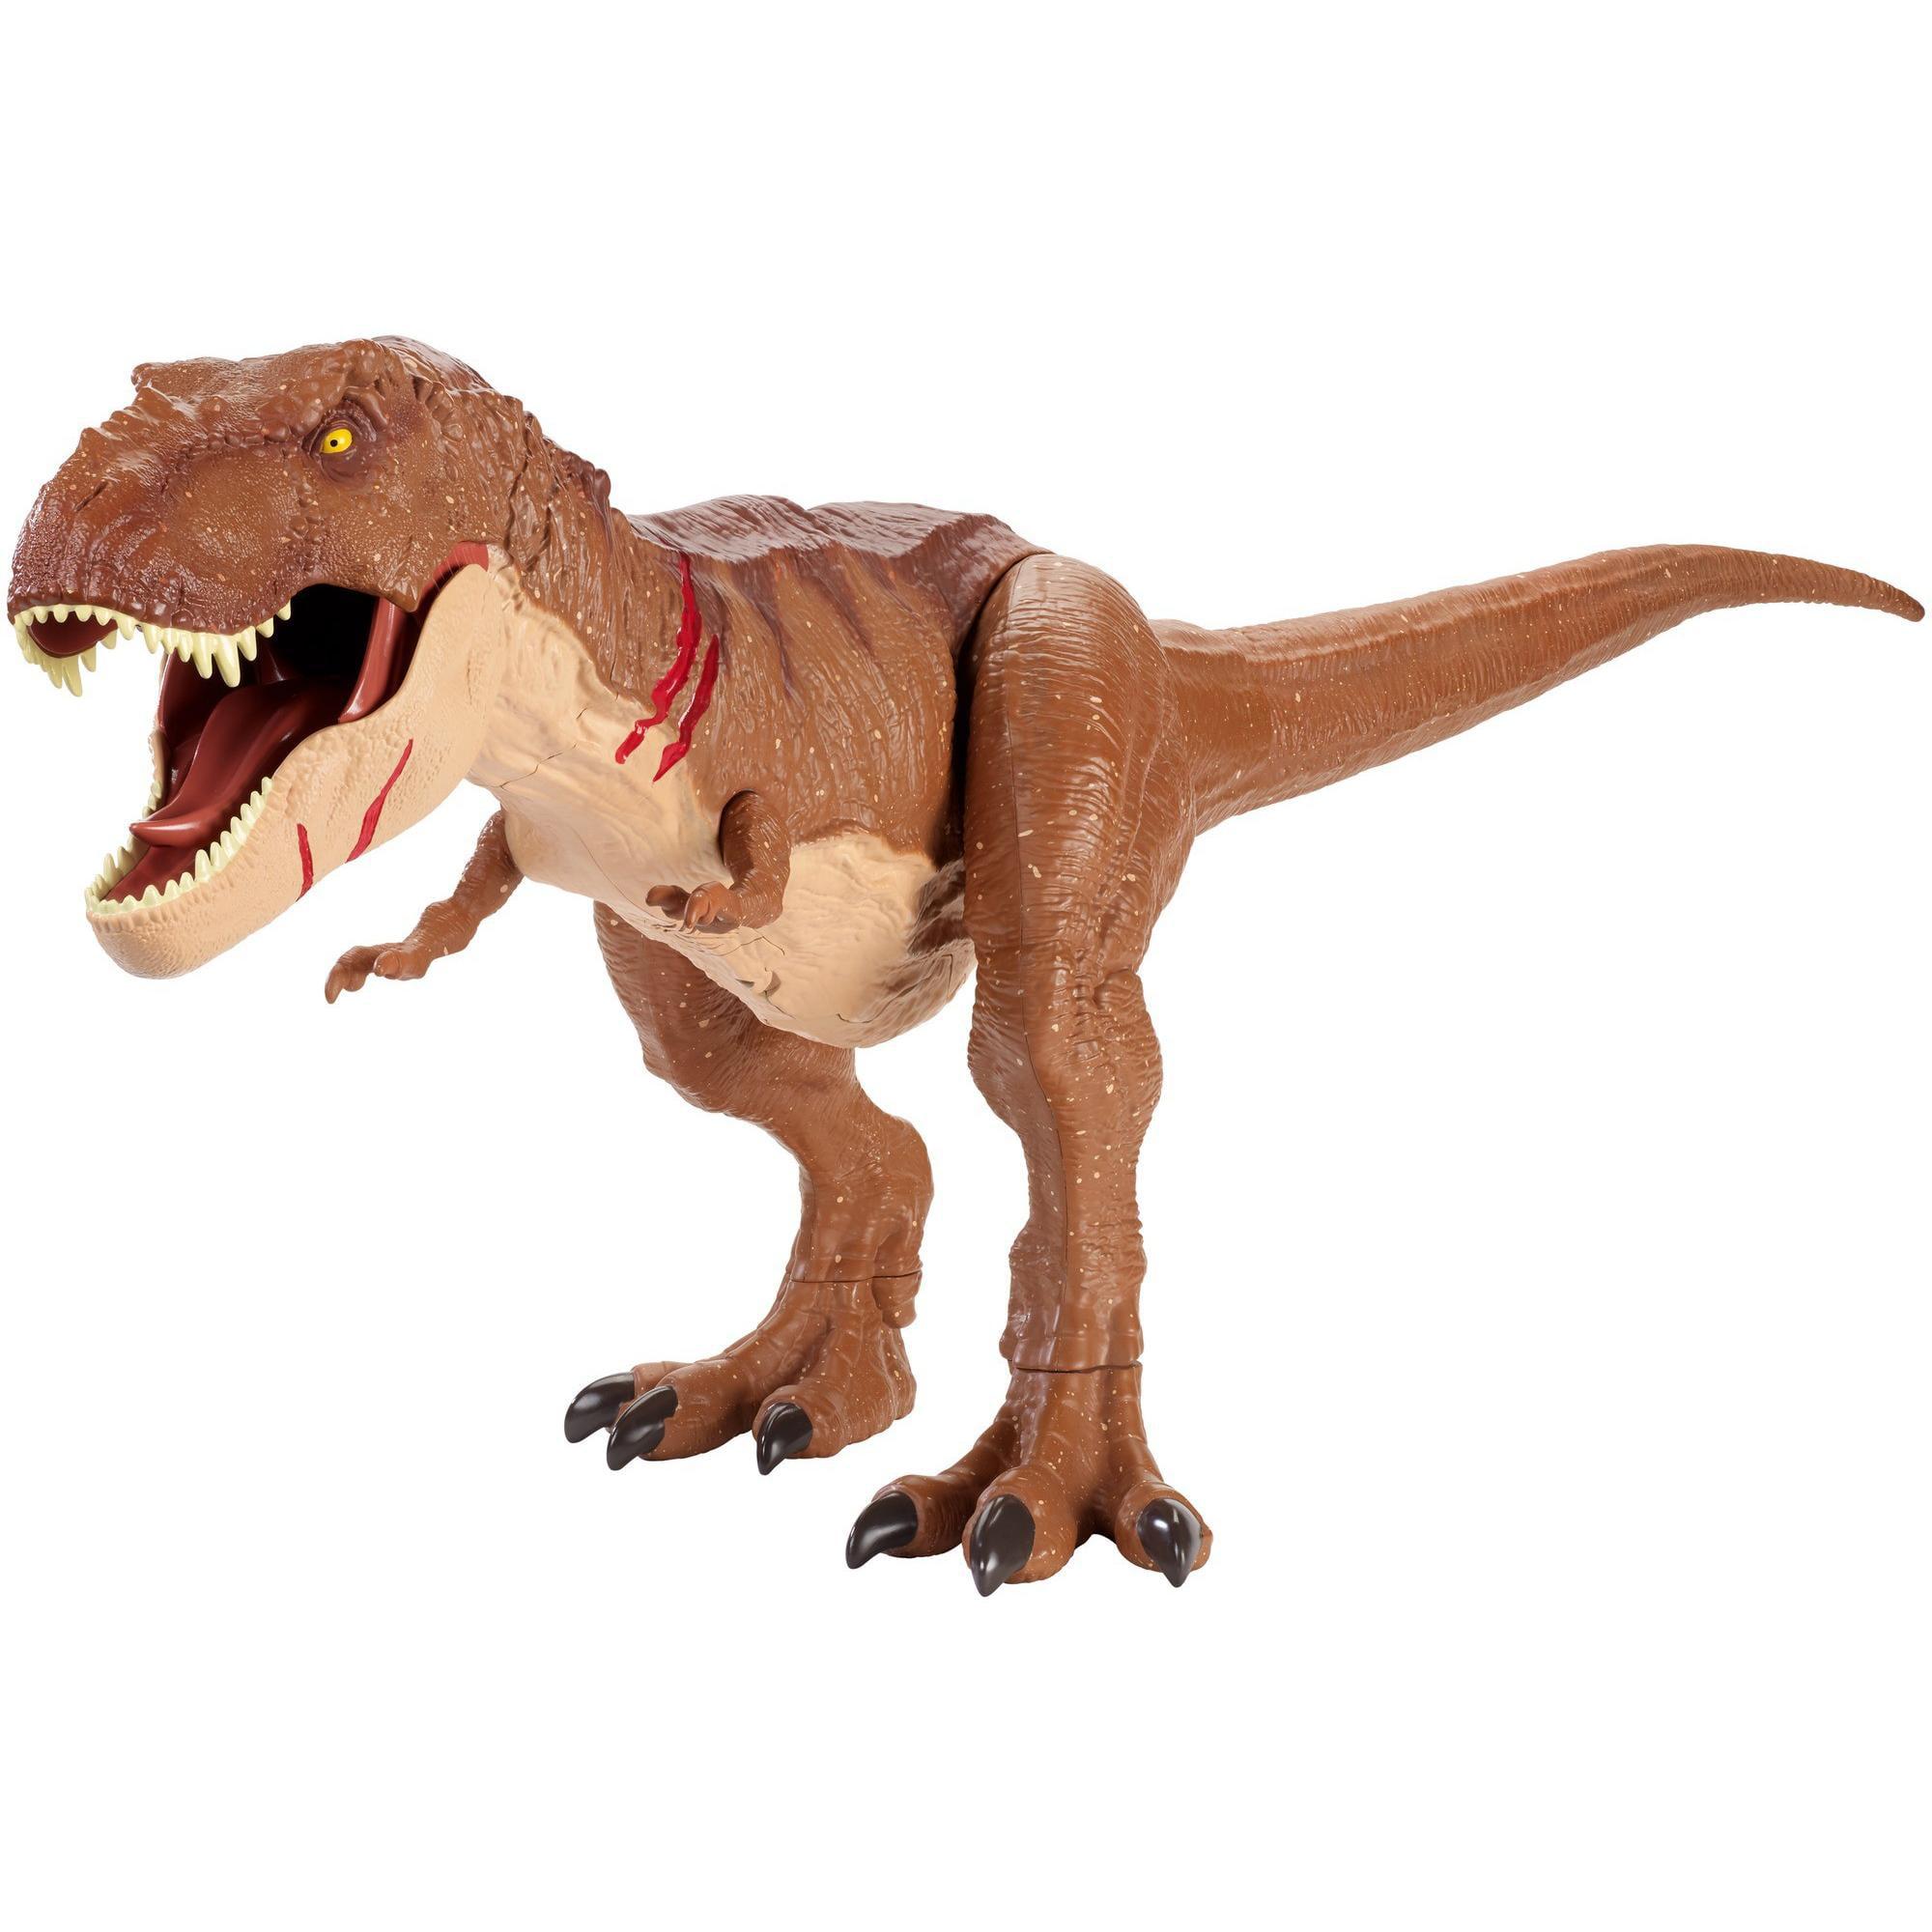 Jurassic World Battle Damage Roarin' Super Colossal Tyrannosaurus Rex